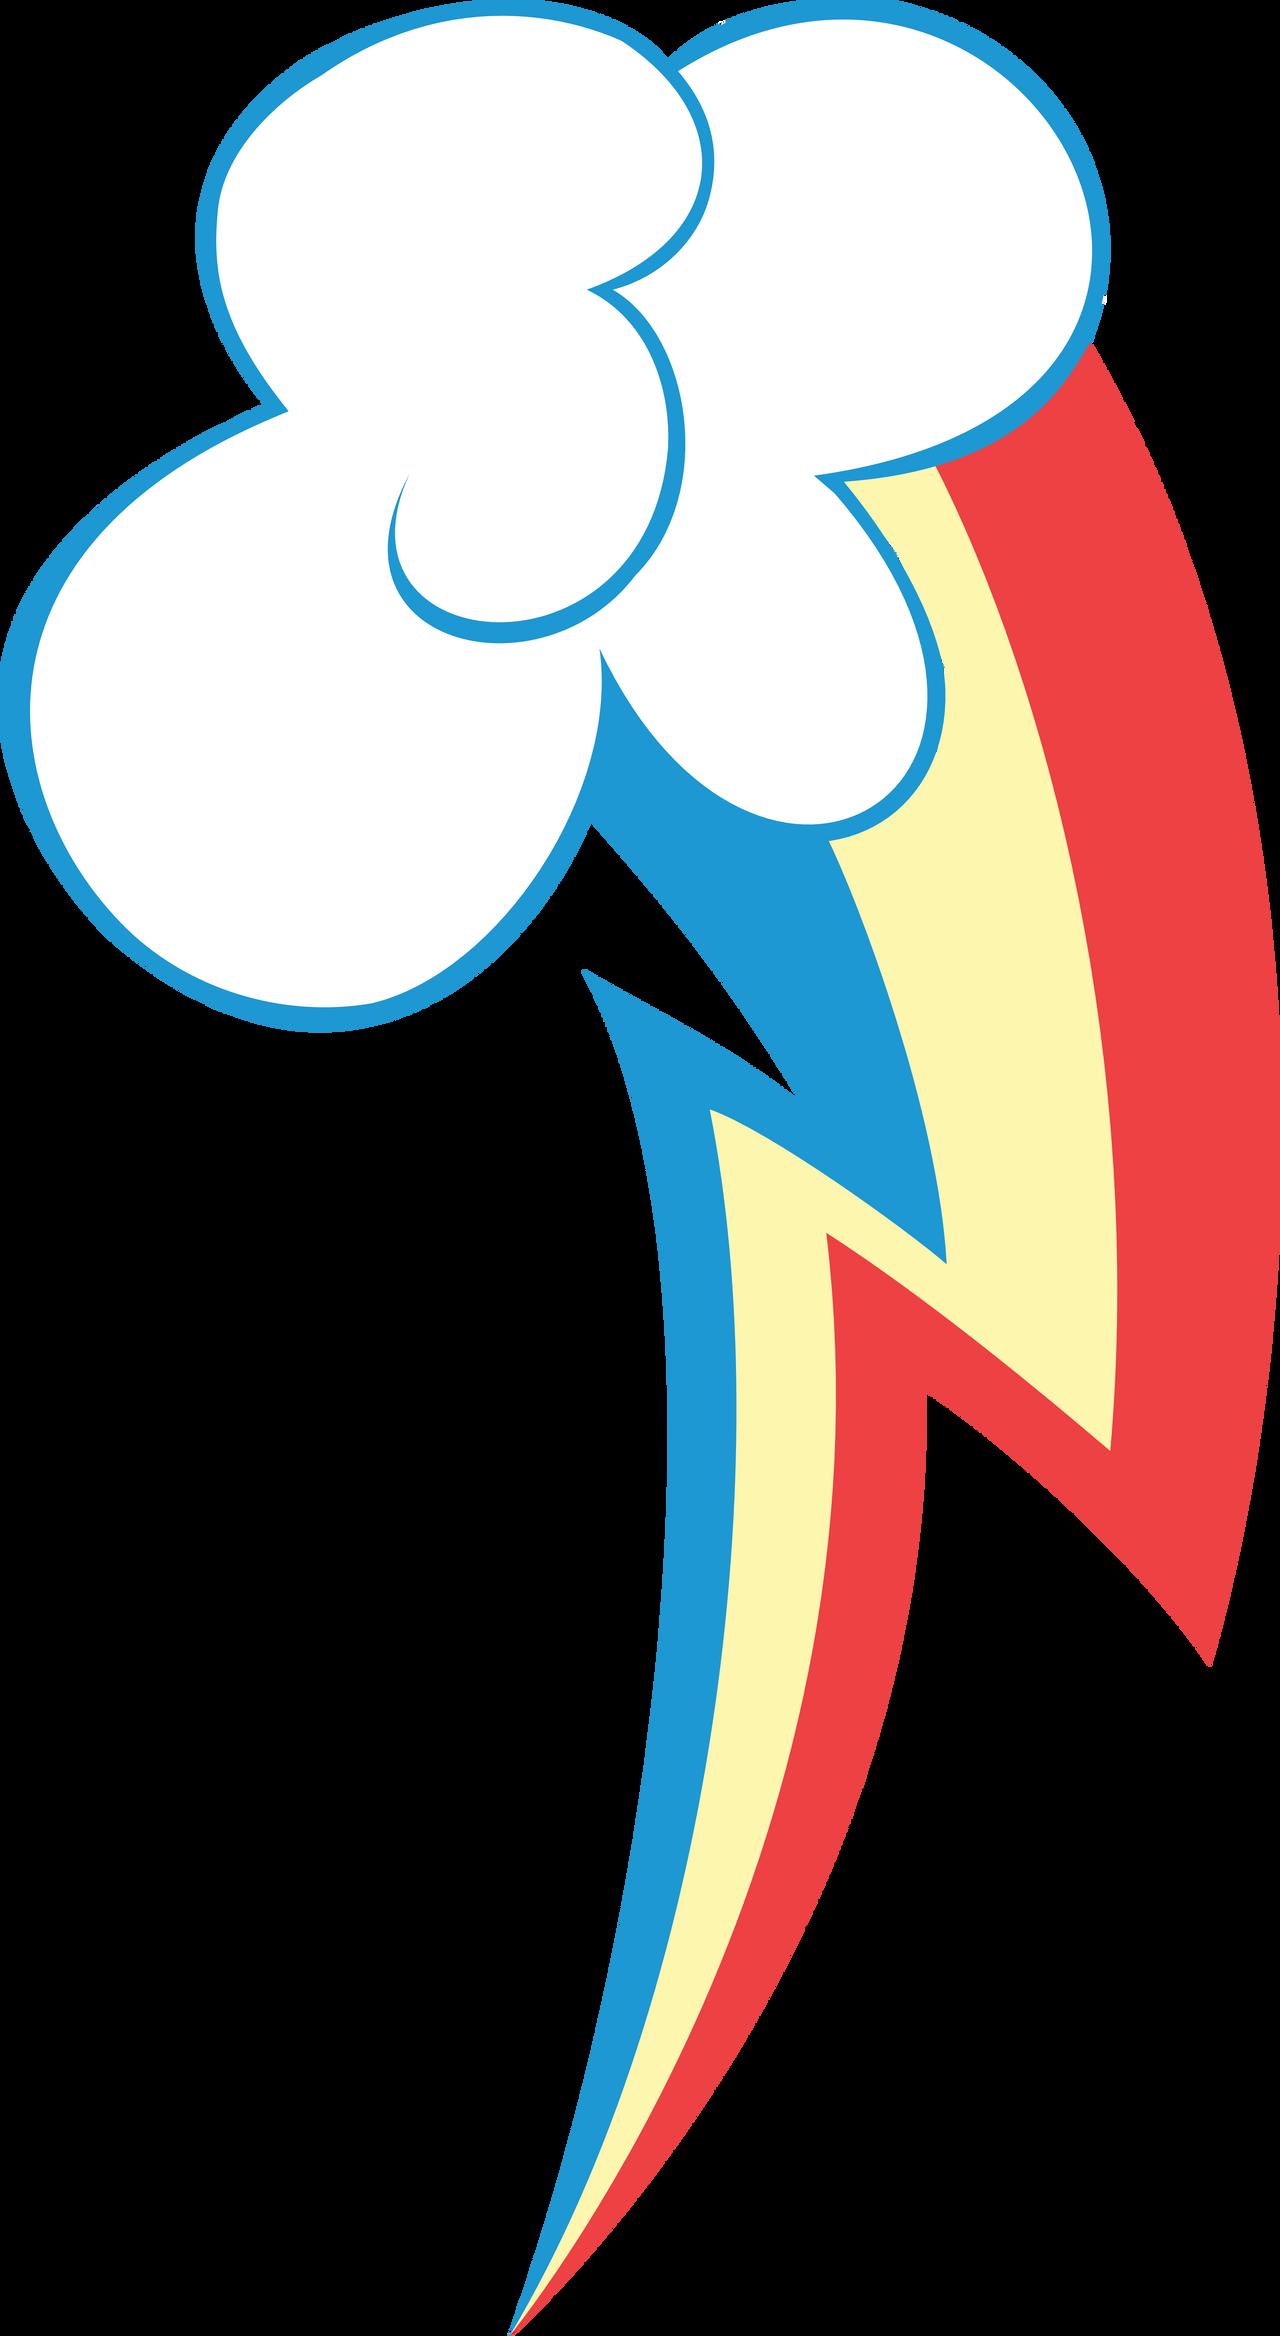 Rainbow Dash Cutie Mark Vector by Mortris on DeviantArt